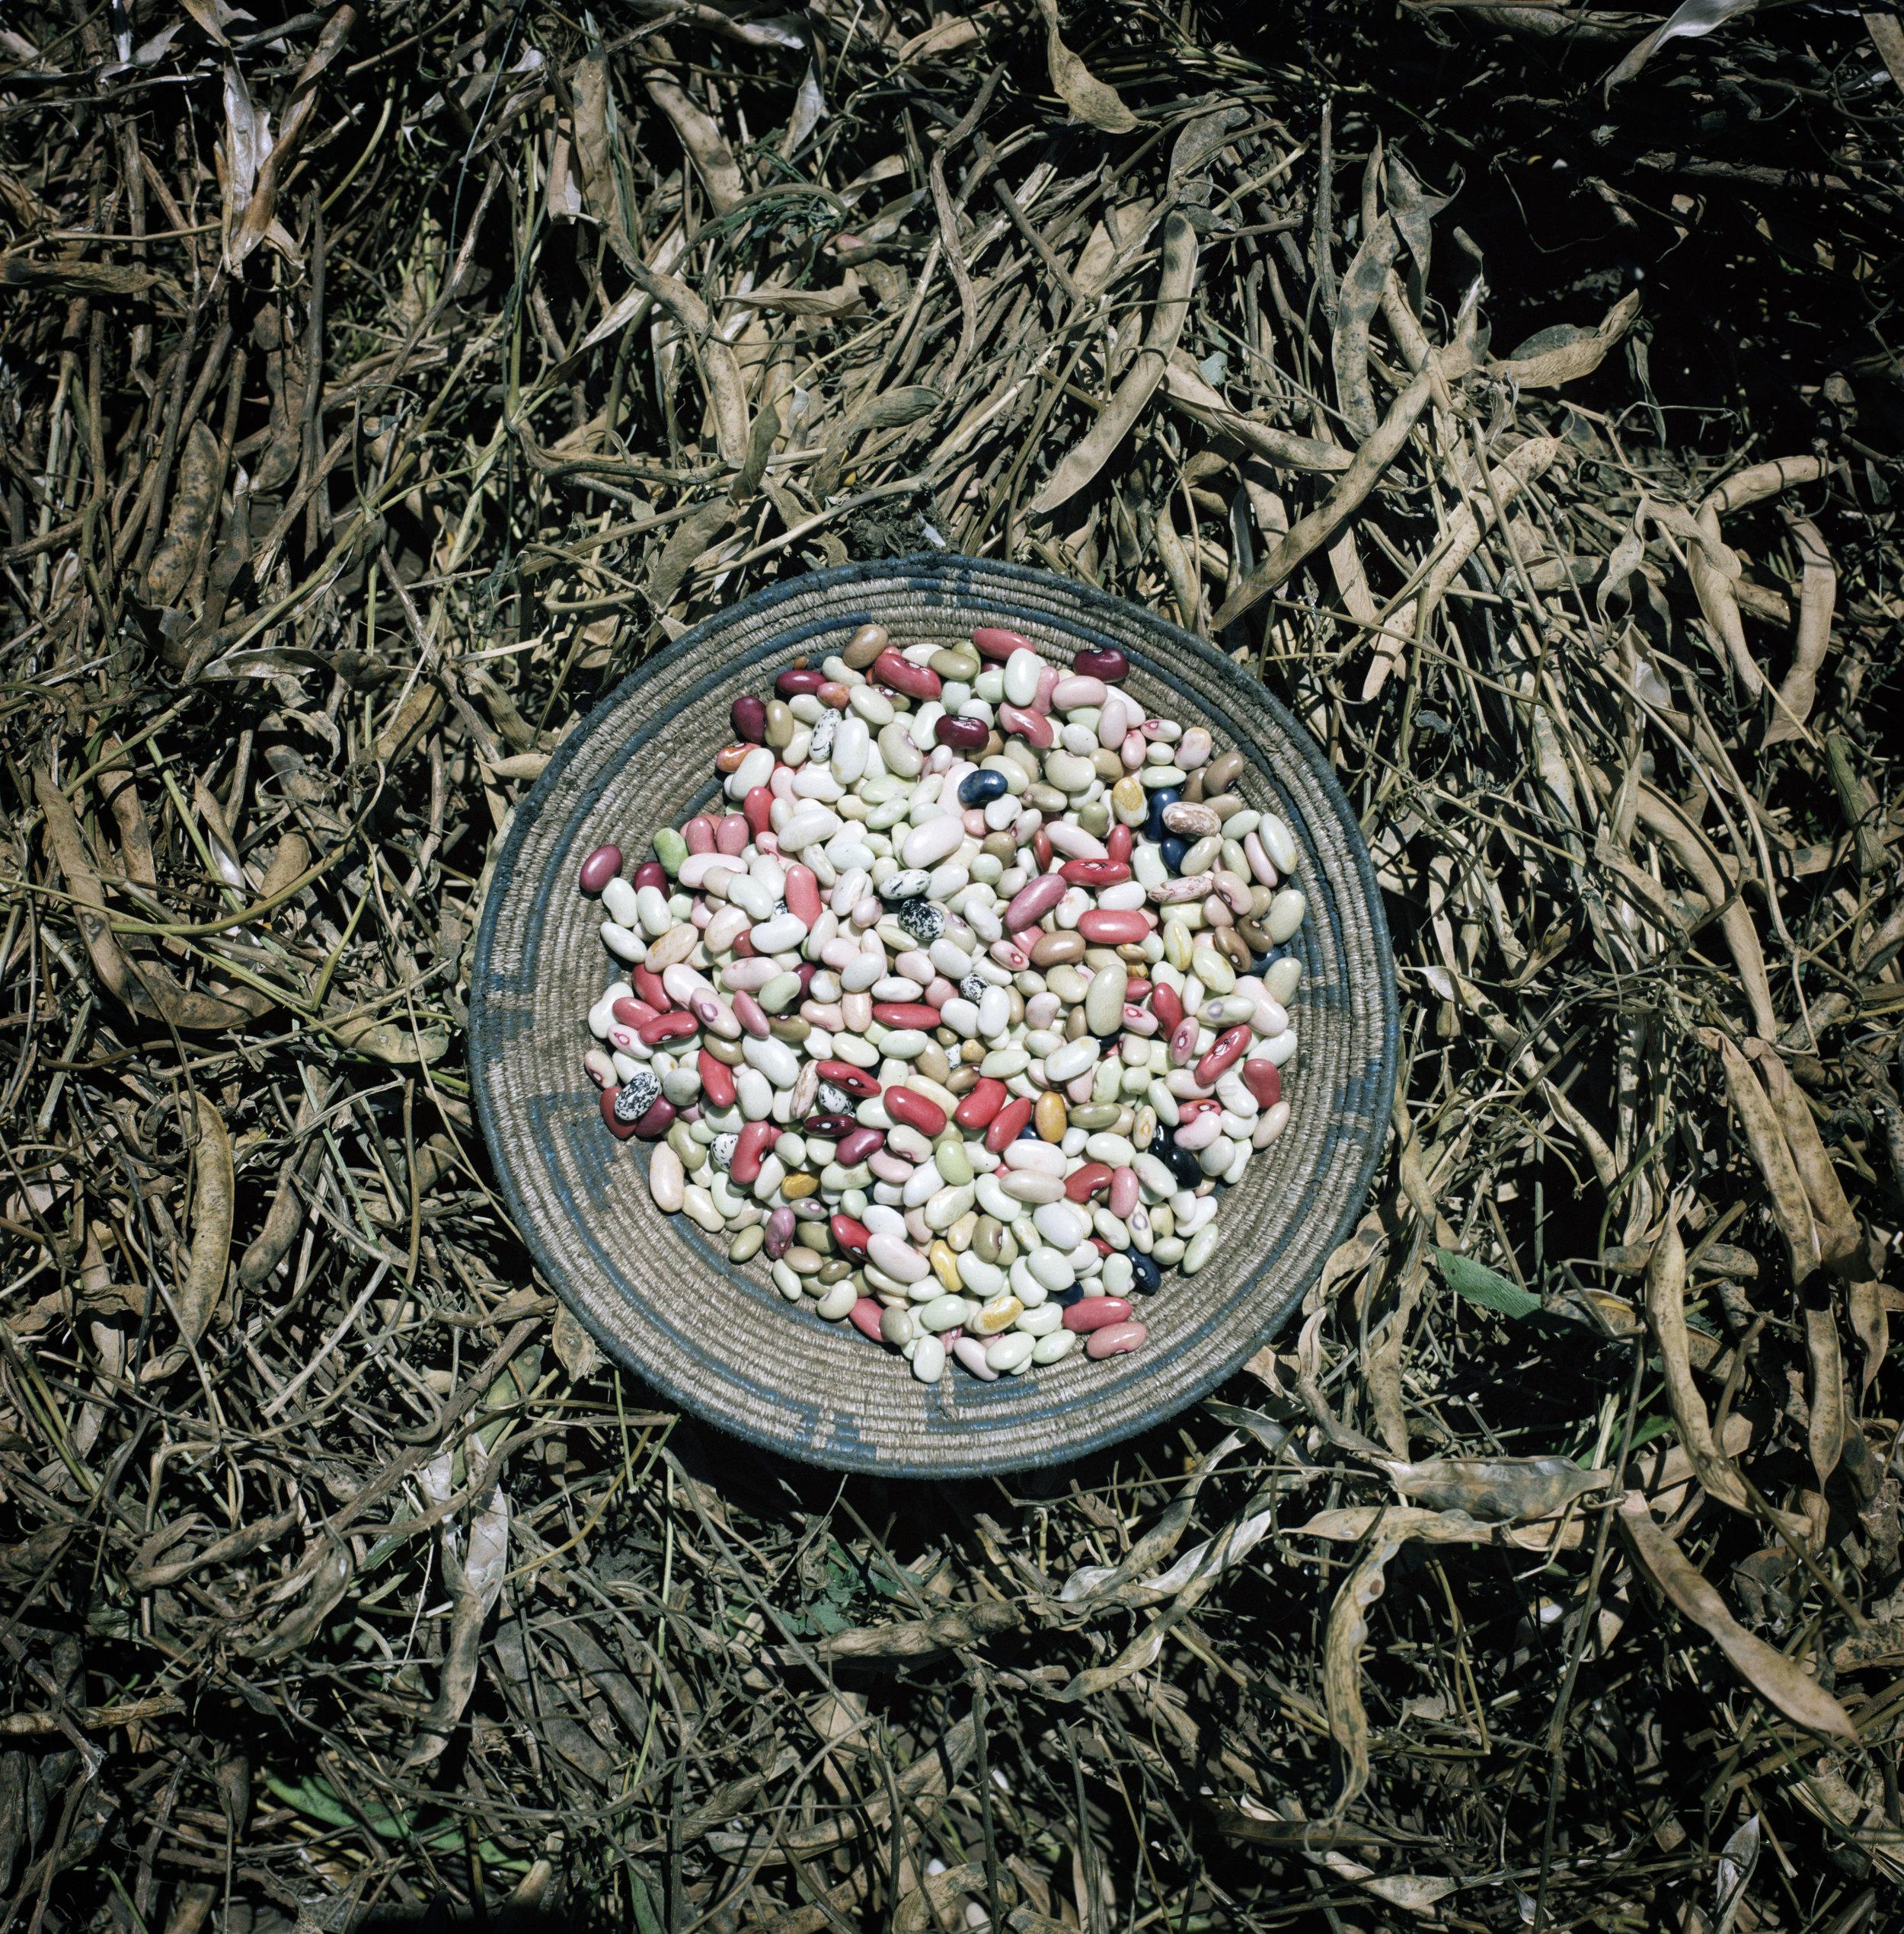 Burundi  A plate of dried pulses.